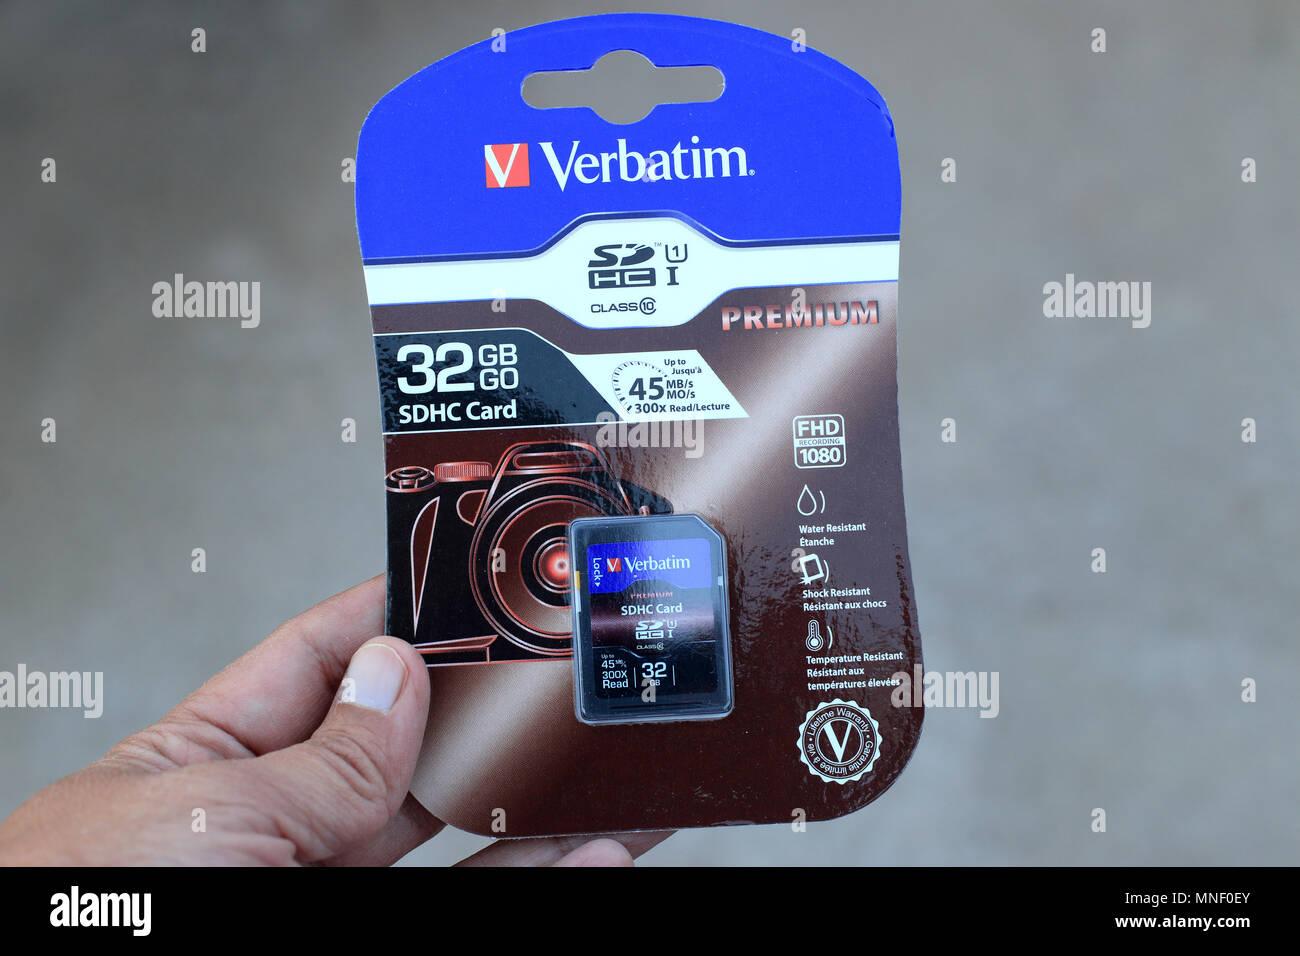 Verbatim 32GB SDHD card - Stock Image